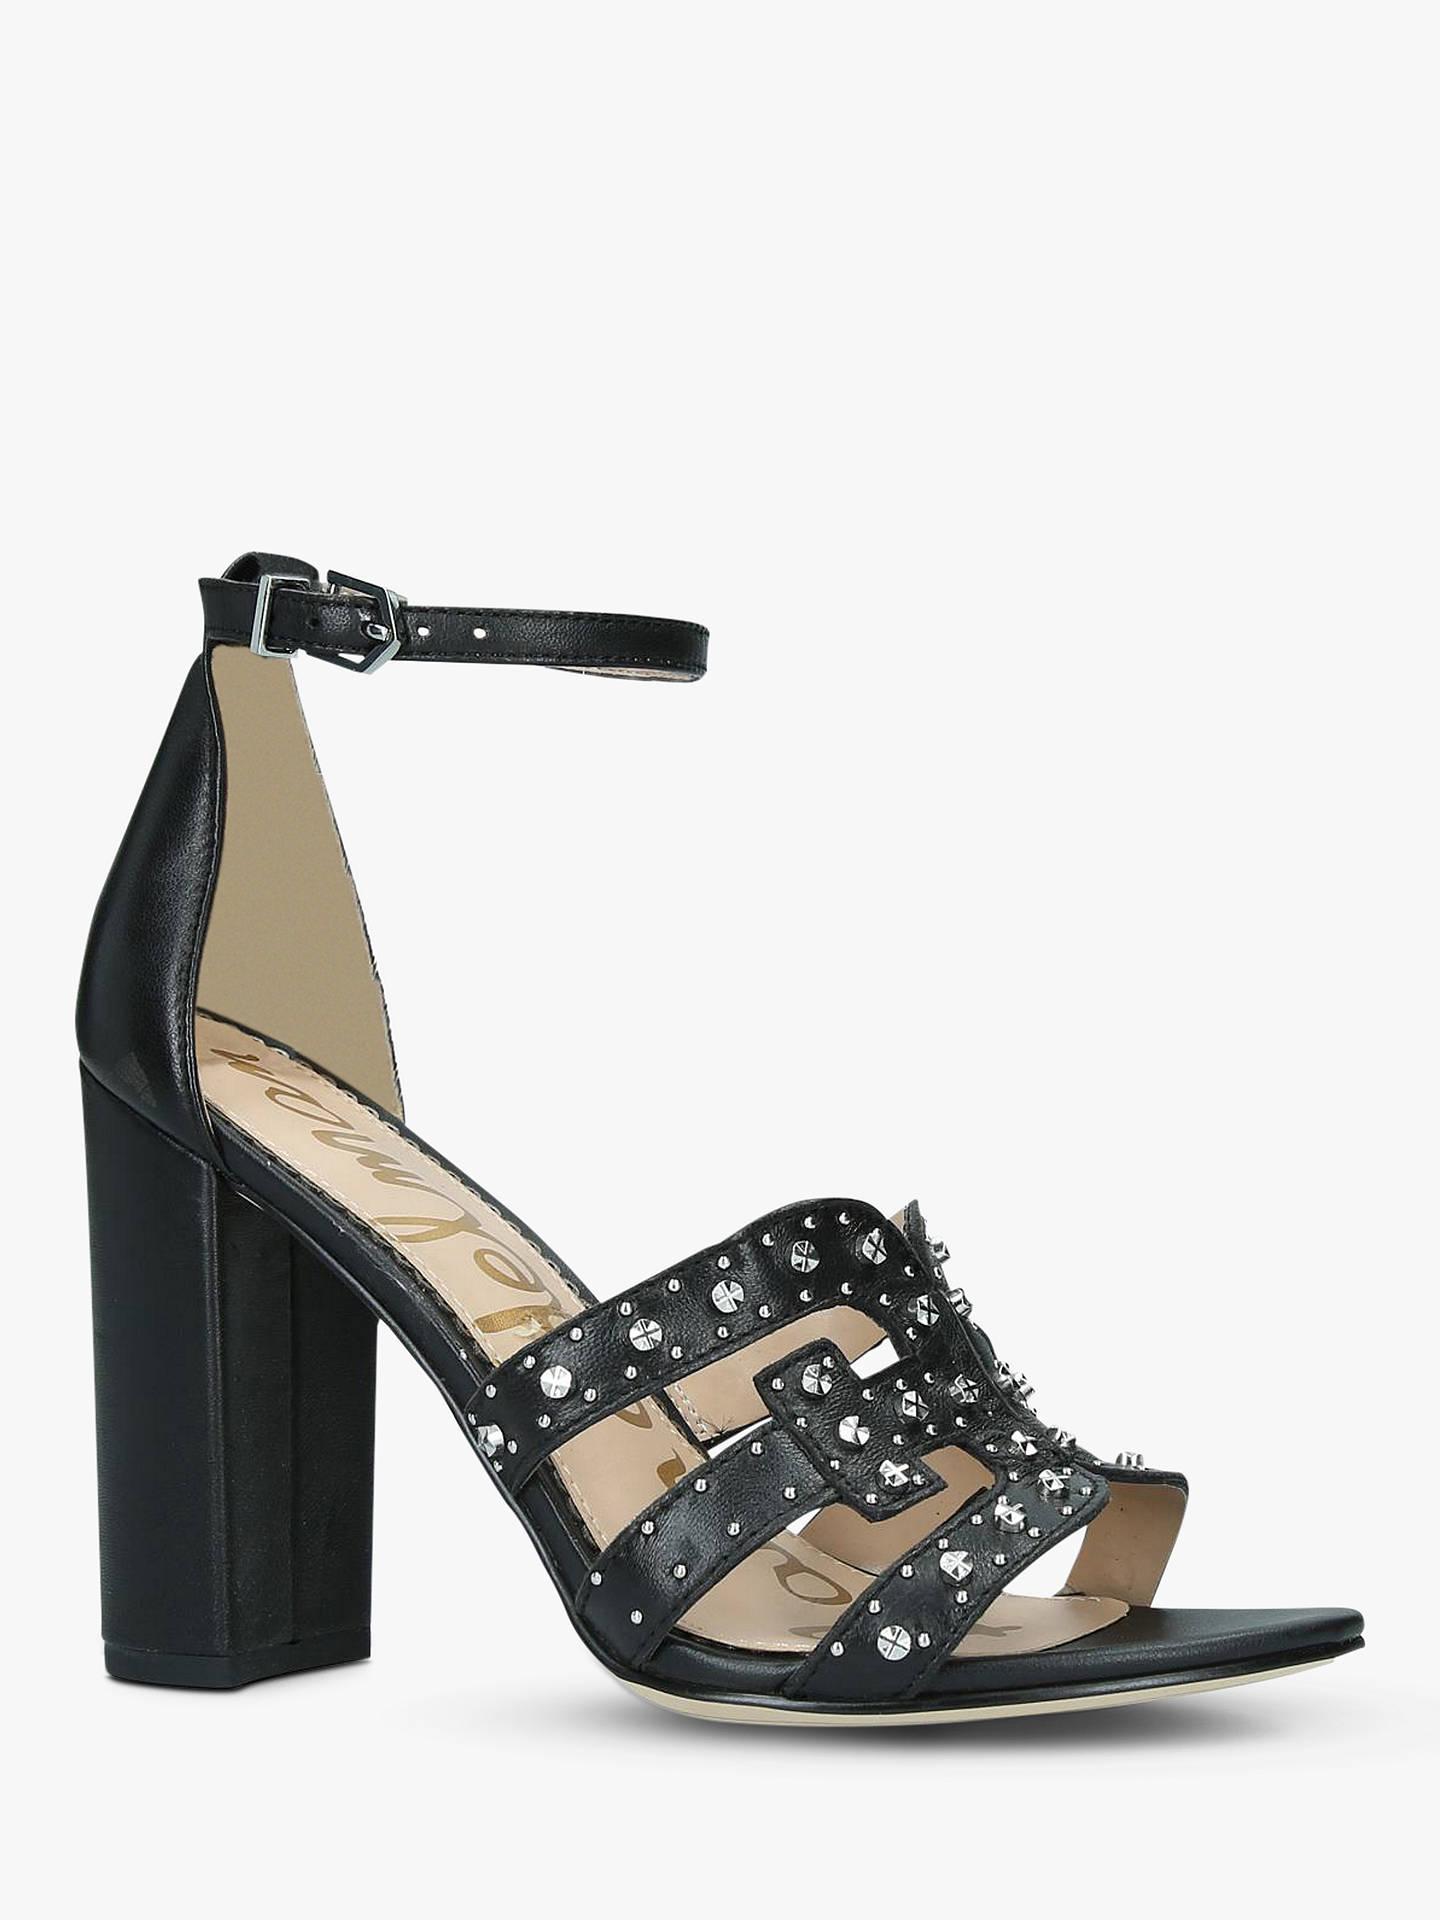 6b25df7c1 Sam Edelman Yasha Leather Studded Heeled Sandals at John Lewis ...